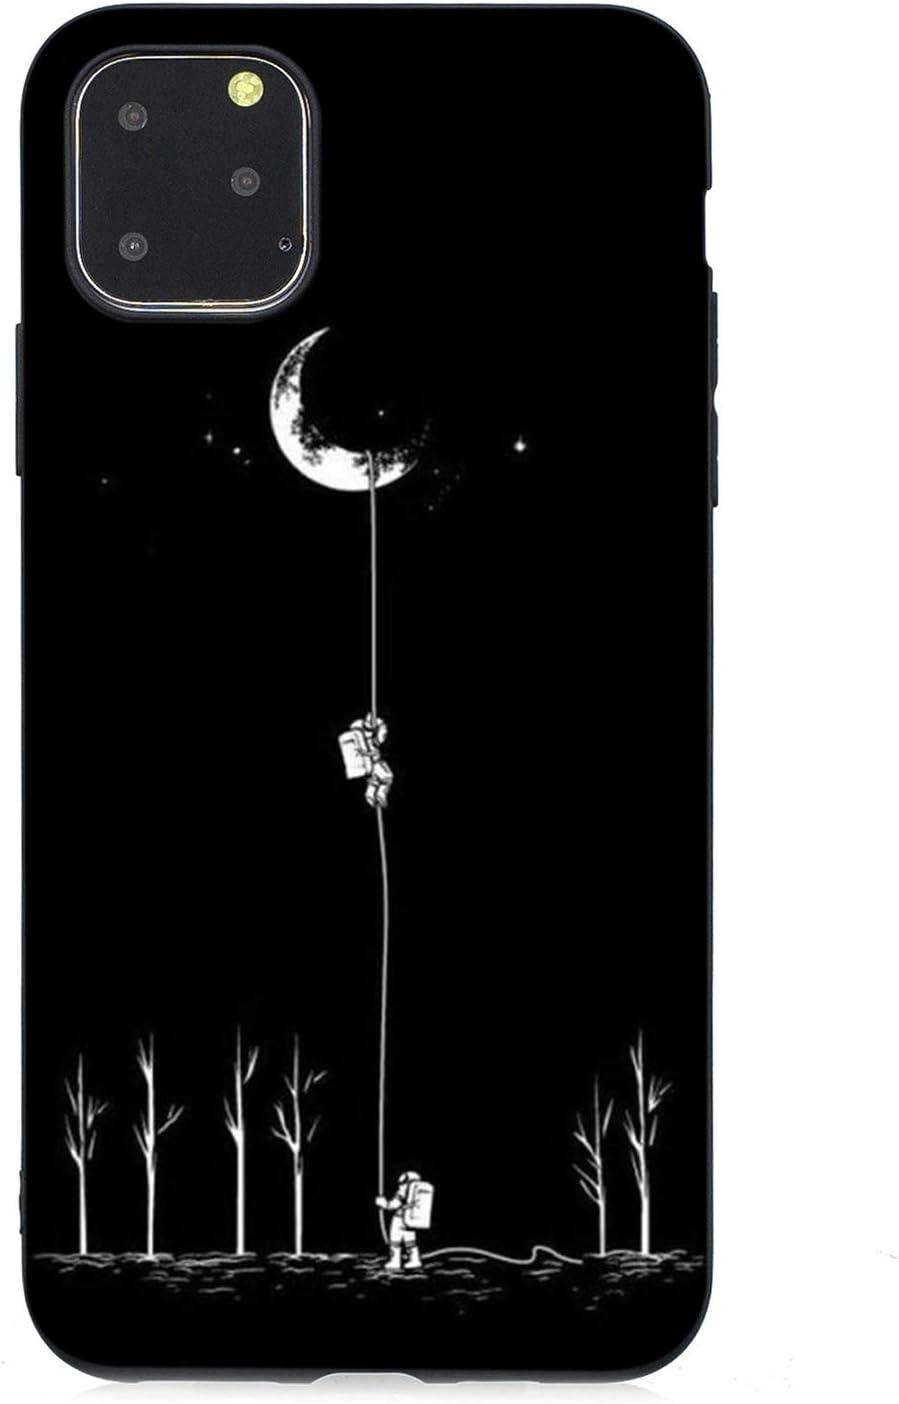 WIWJ Funda para Huawei P20 Carcasas Negro Mate Ultrafina Silicona TPU Piel Cover Disney Dibujos 360 Tumblr Dura con Tapa Madera Anti Ara/ñazos Bumper Case Astronauta Choques y Anti